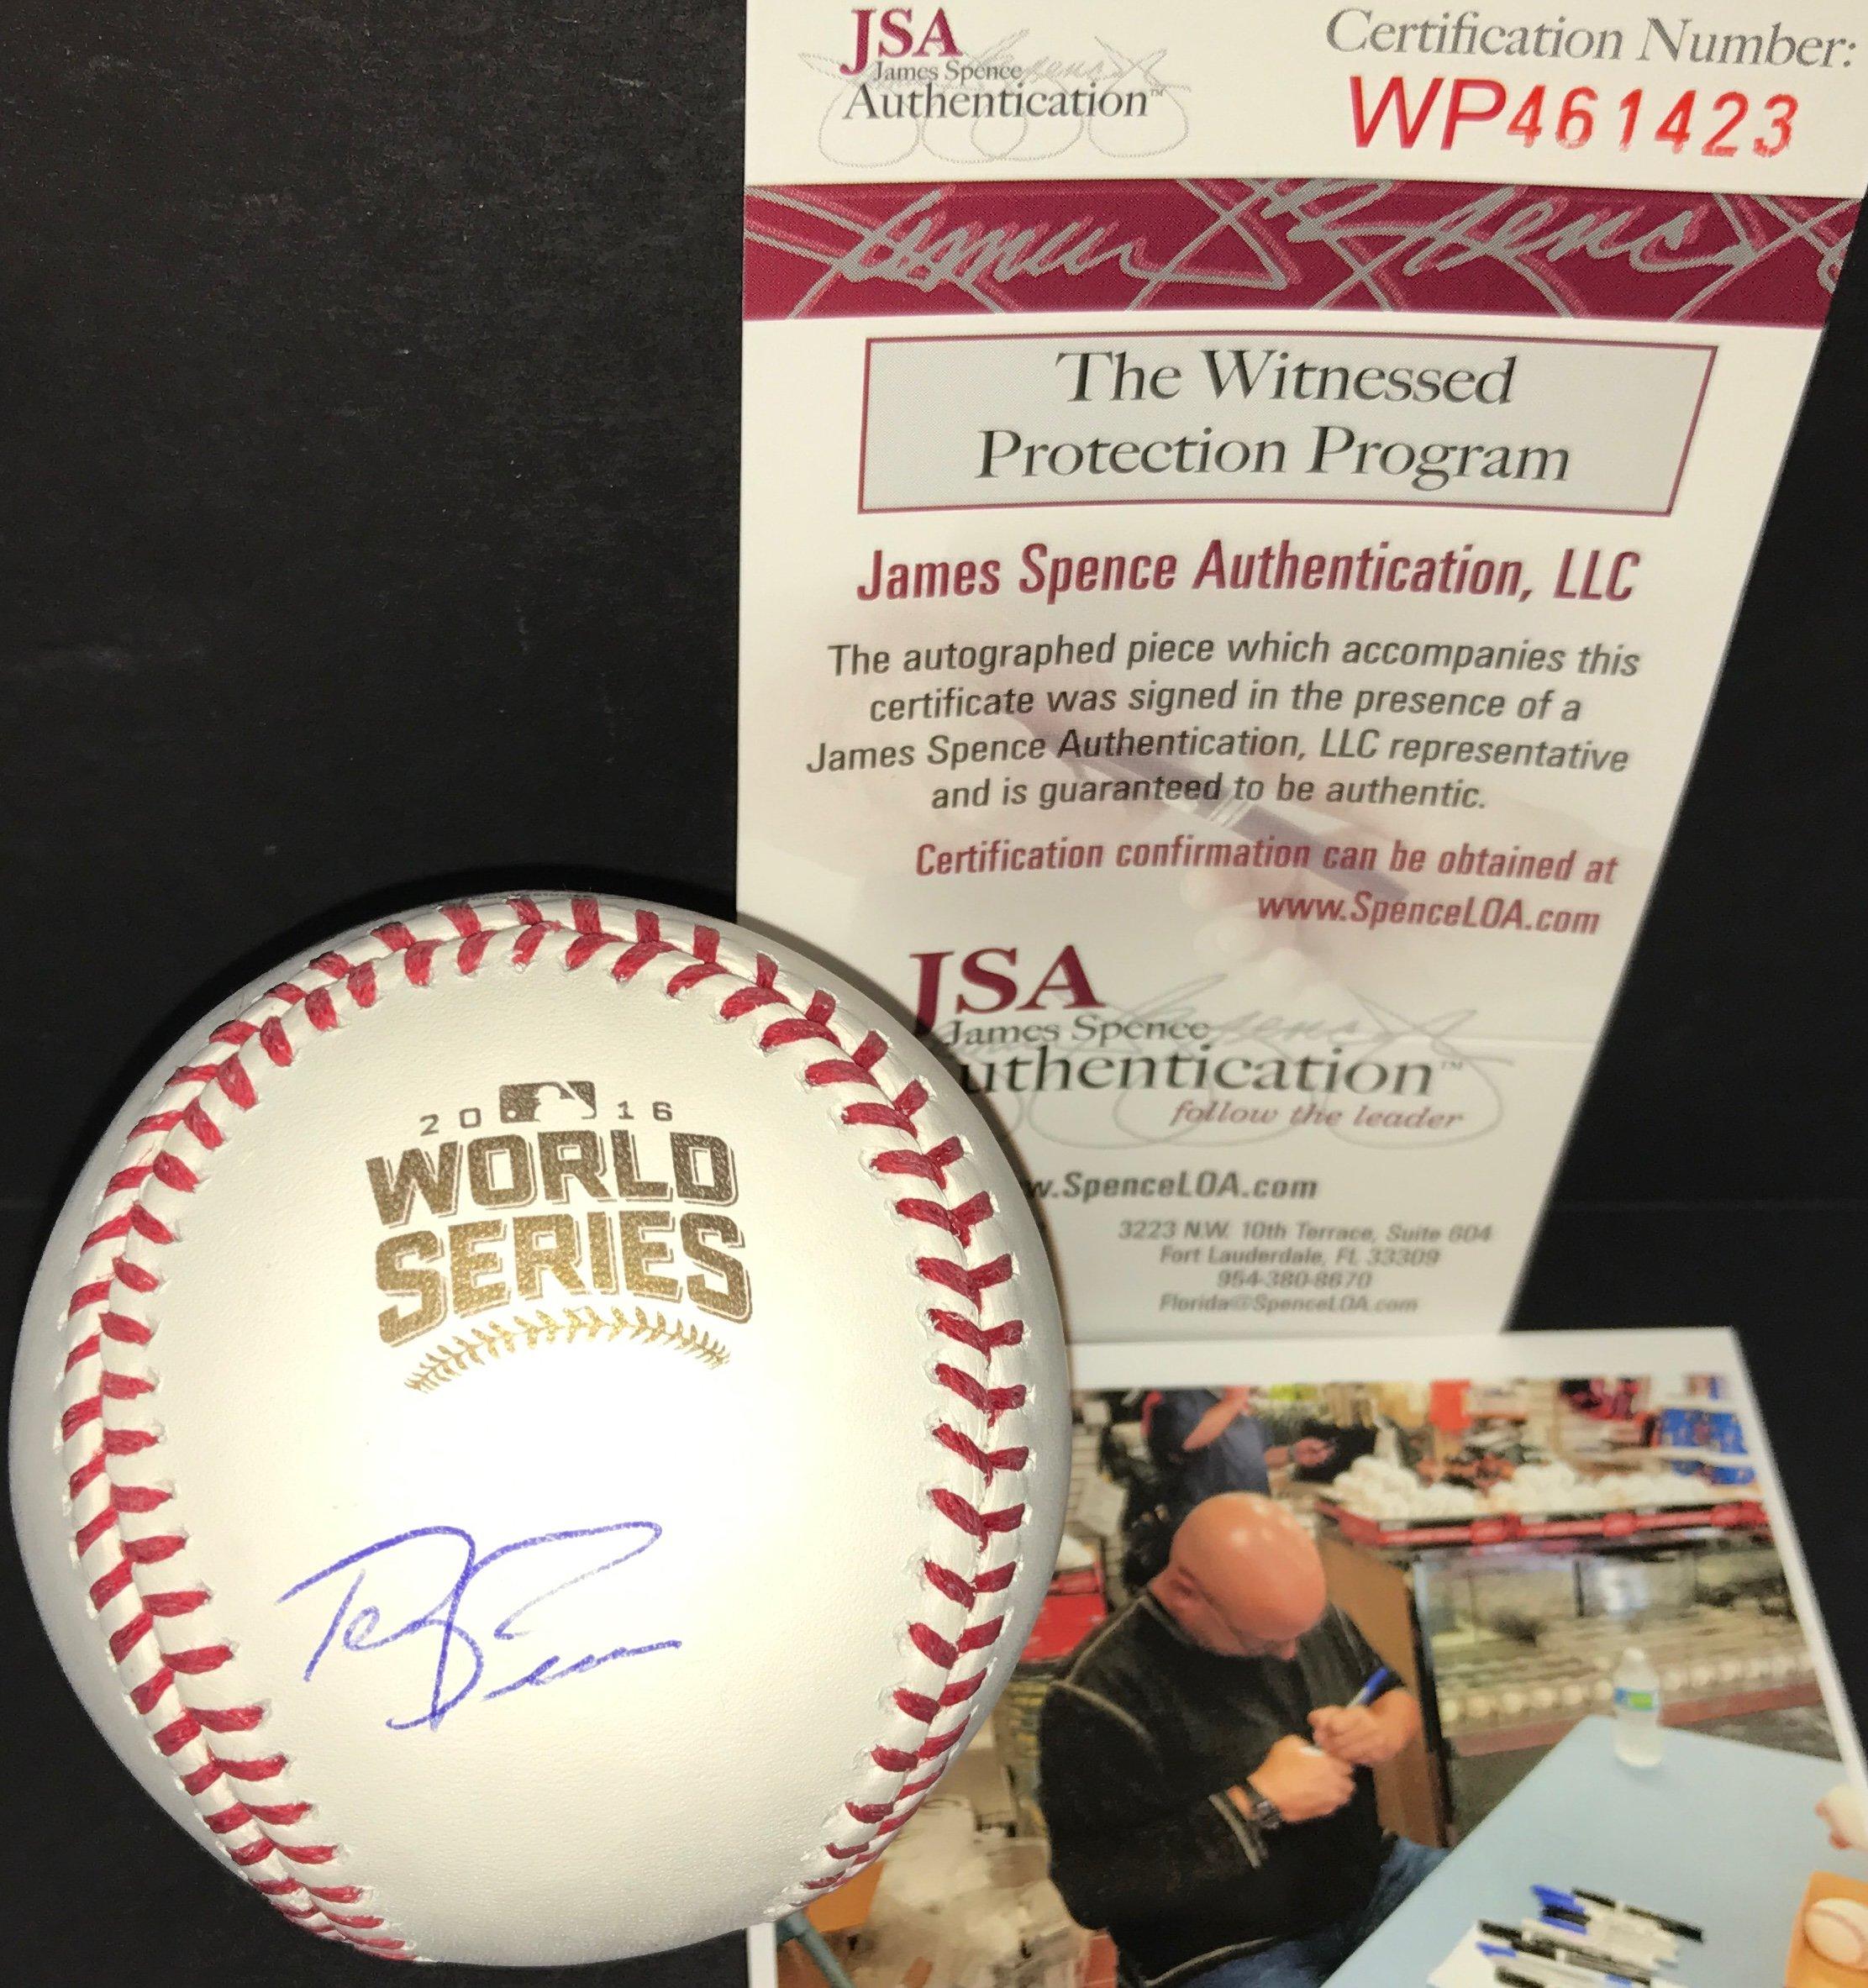 Terry Francona Cleveland Indians Autographed Signed 2016 World Series Baseball Proof JSA COA